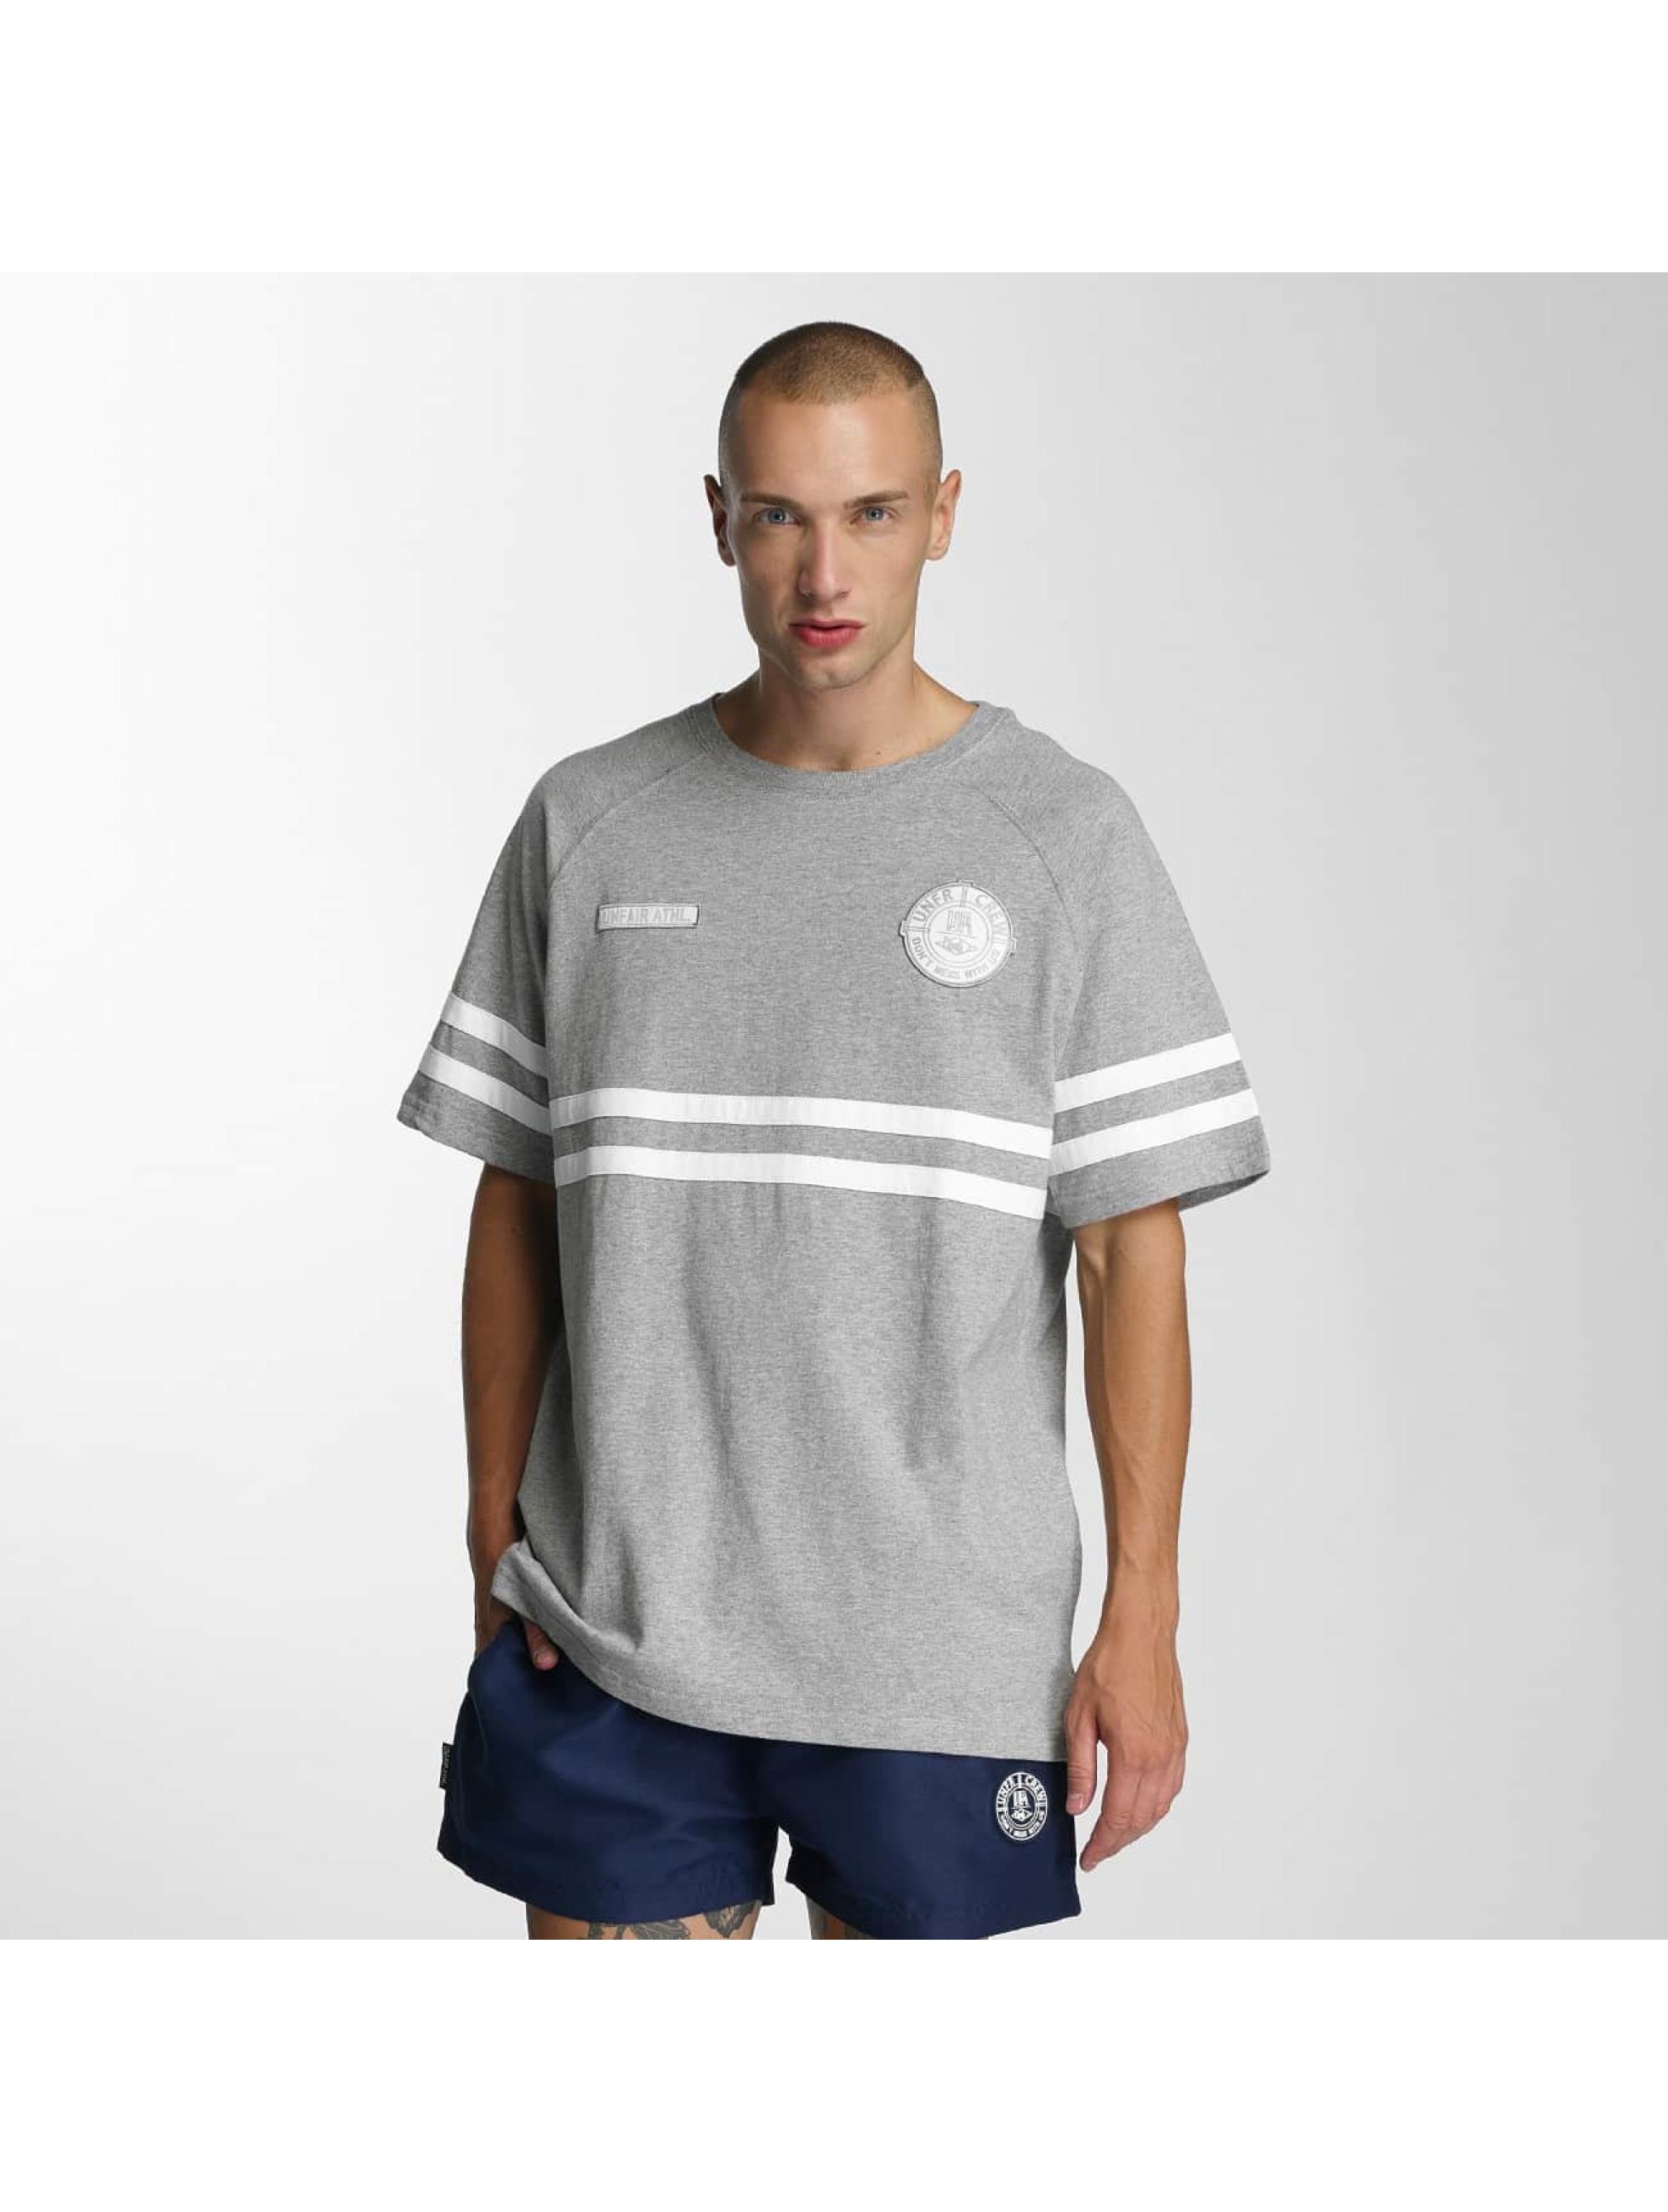 UNFAIR ATHLETICS T-Shirt DMWU gray